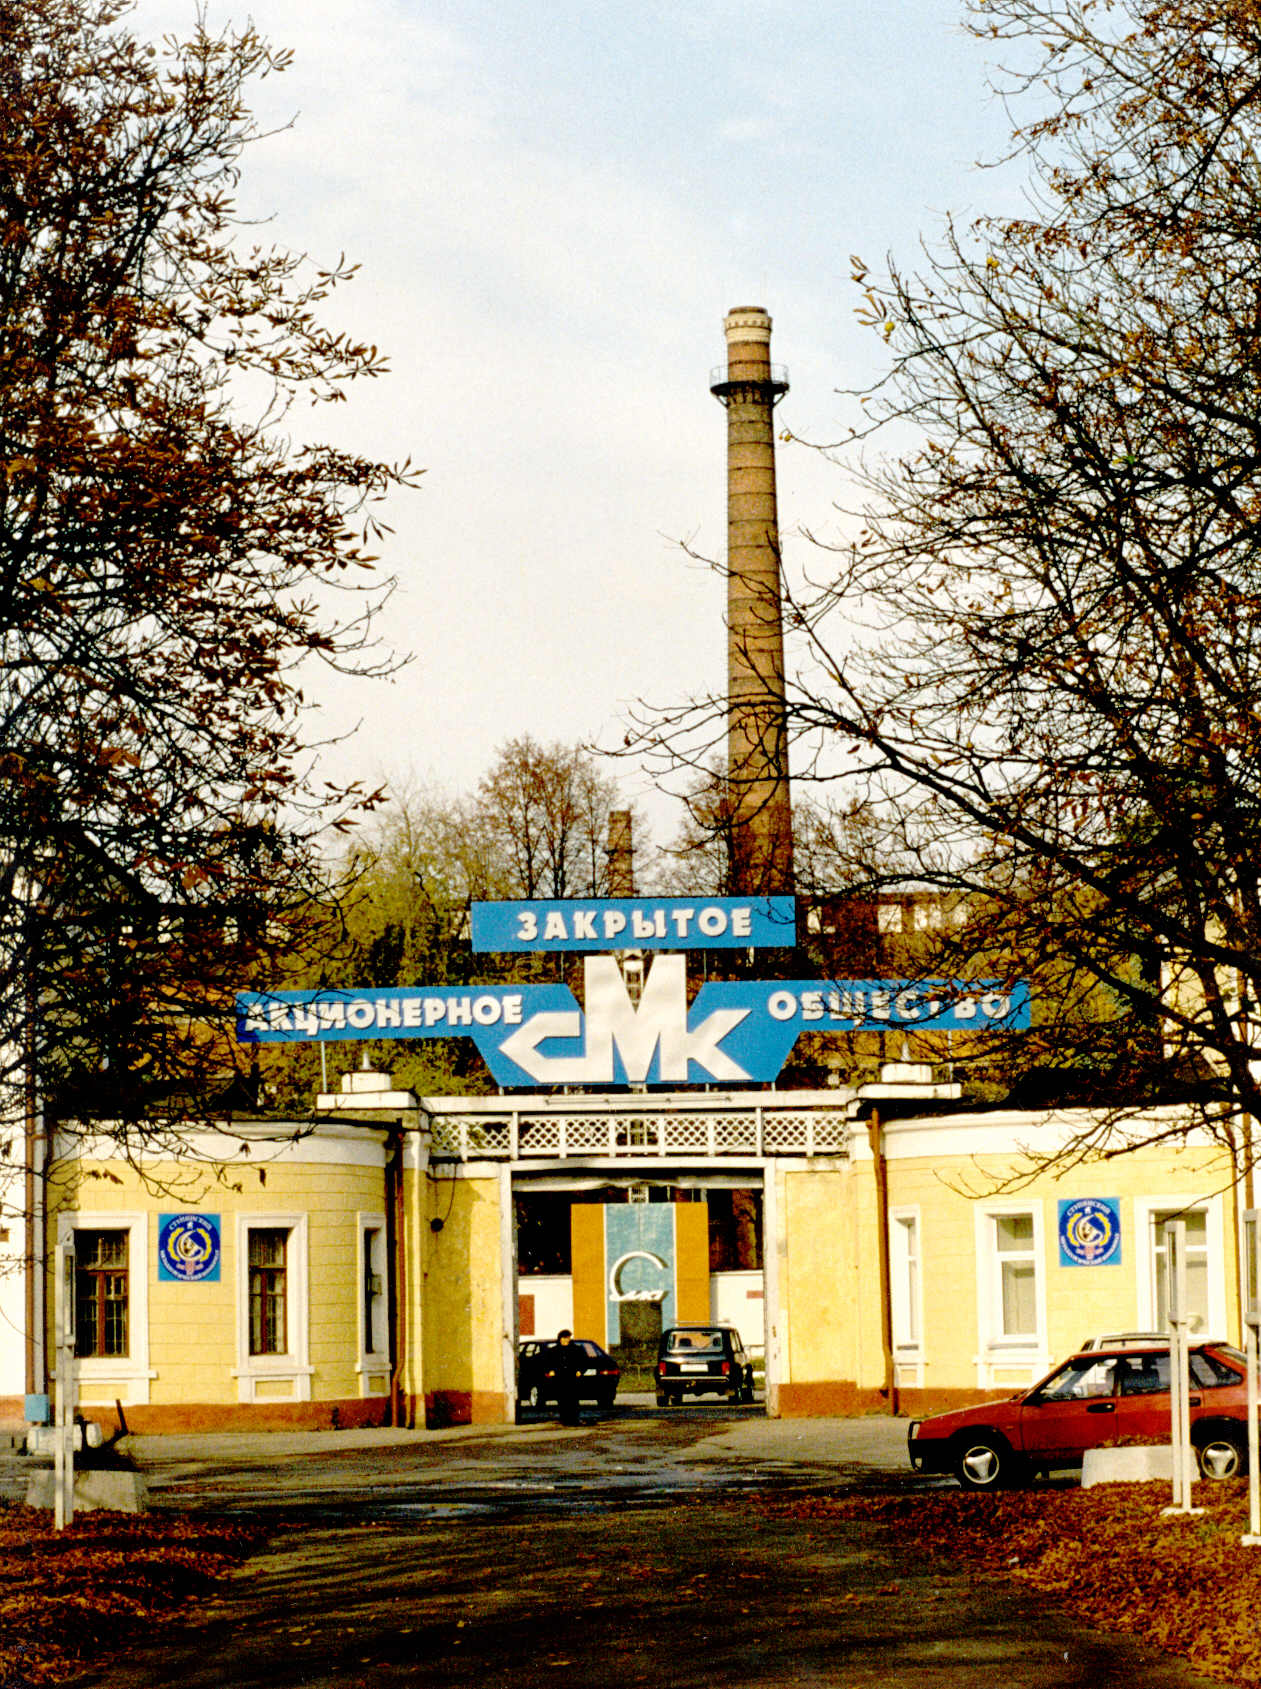 Ступинский металлургический комбинат